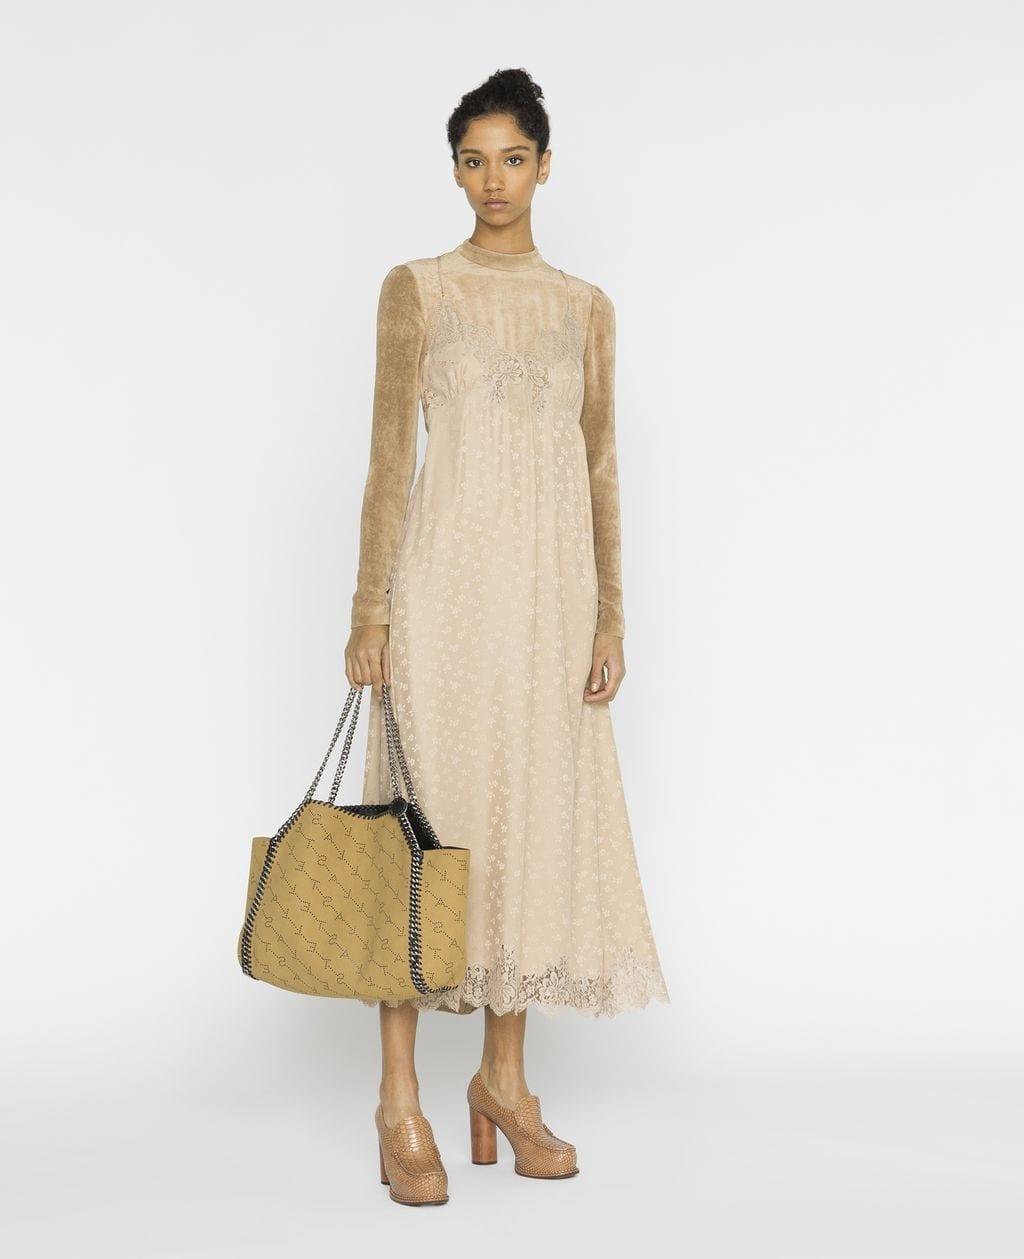 STELLA MCCARTNEY Simone Beige Dress